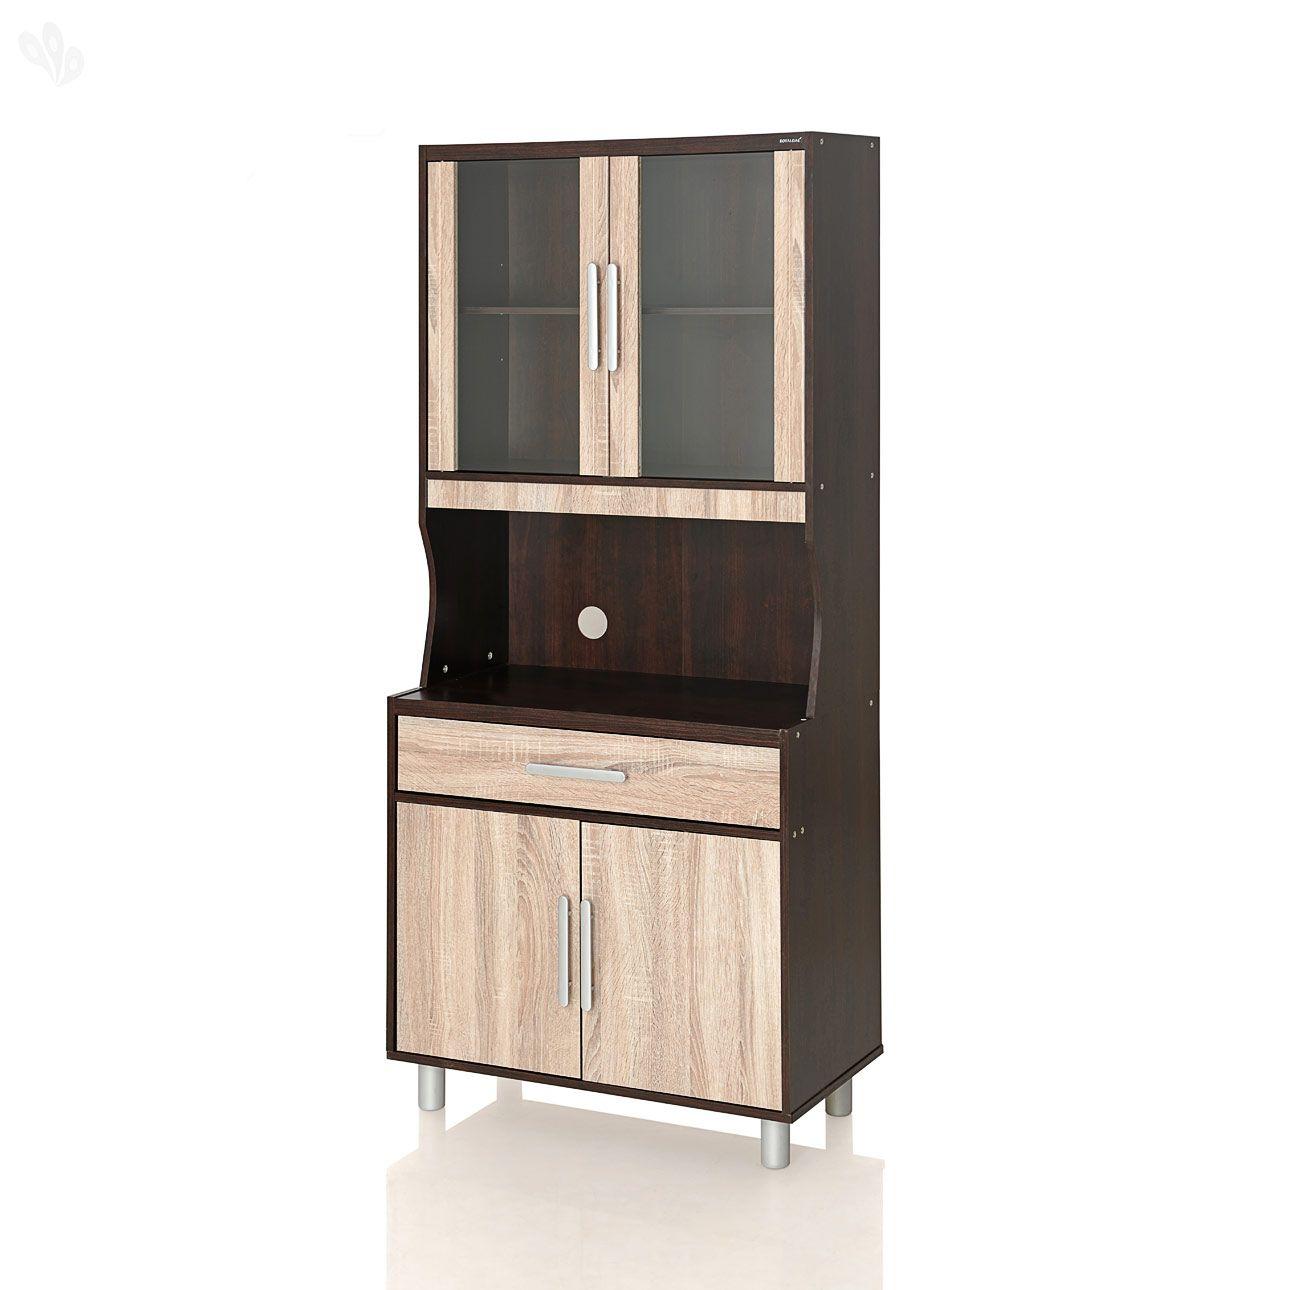 Buy RoyalOak Milan Crockery Cabinet Online From Indias Most Affordable Furniture Brand